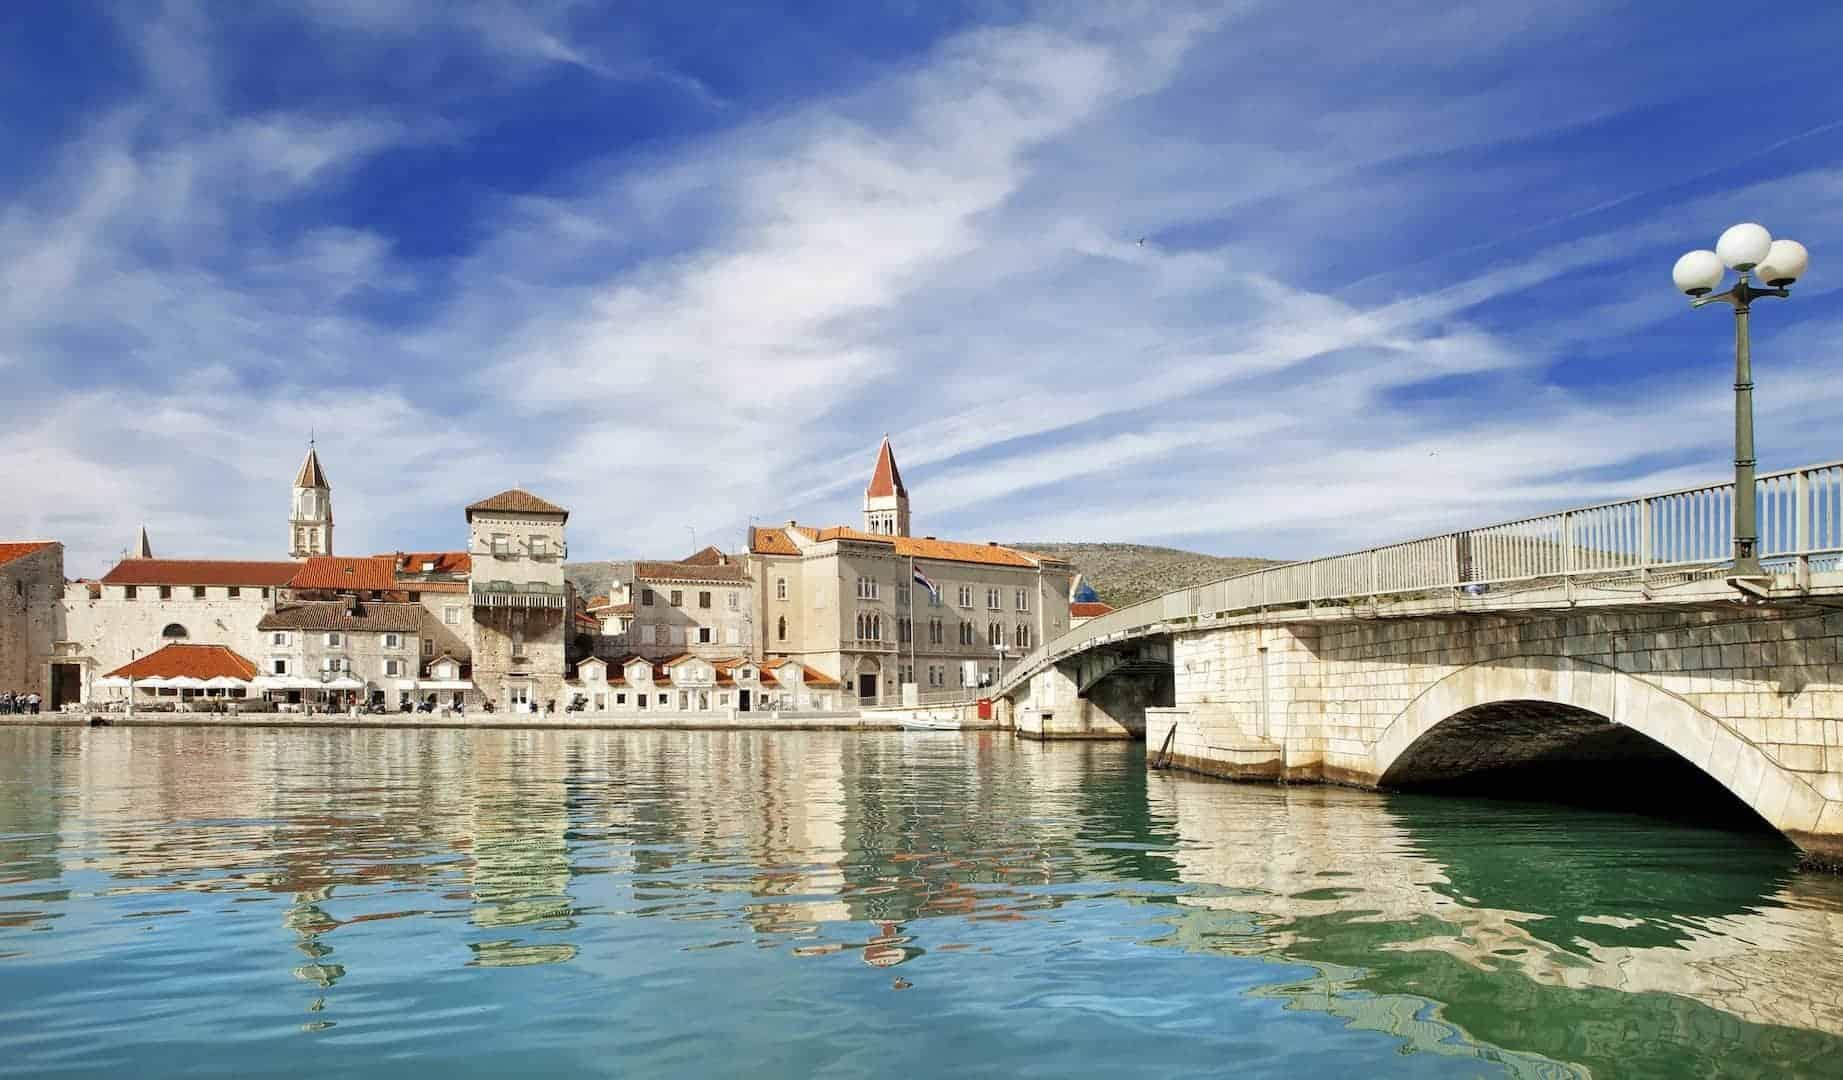 Old town of Trogir in Dalmatia, Croatia.